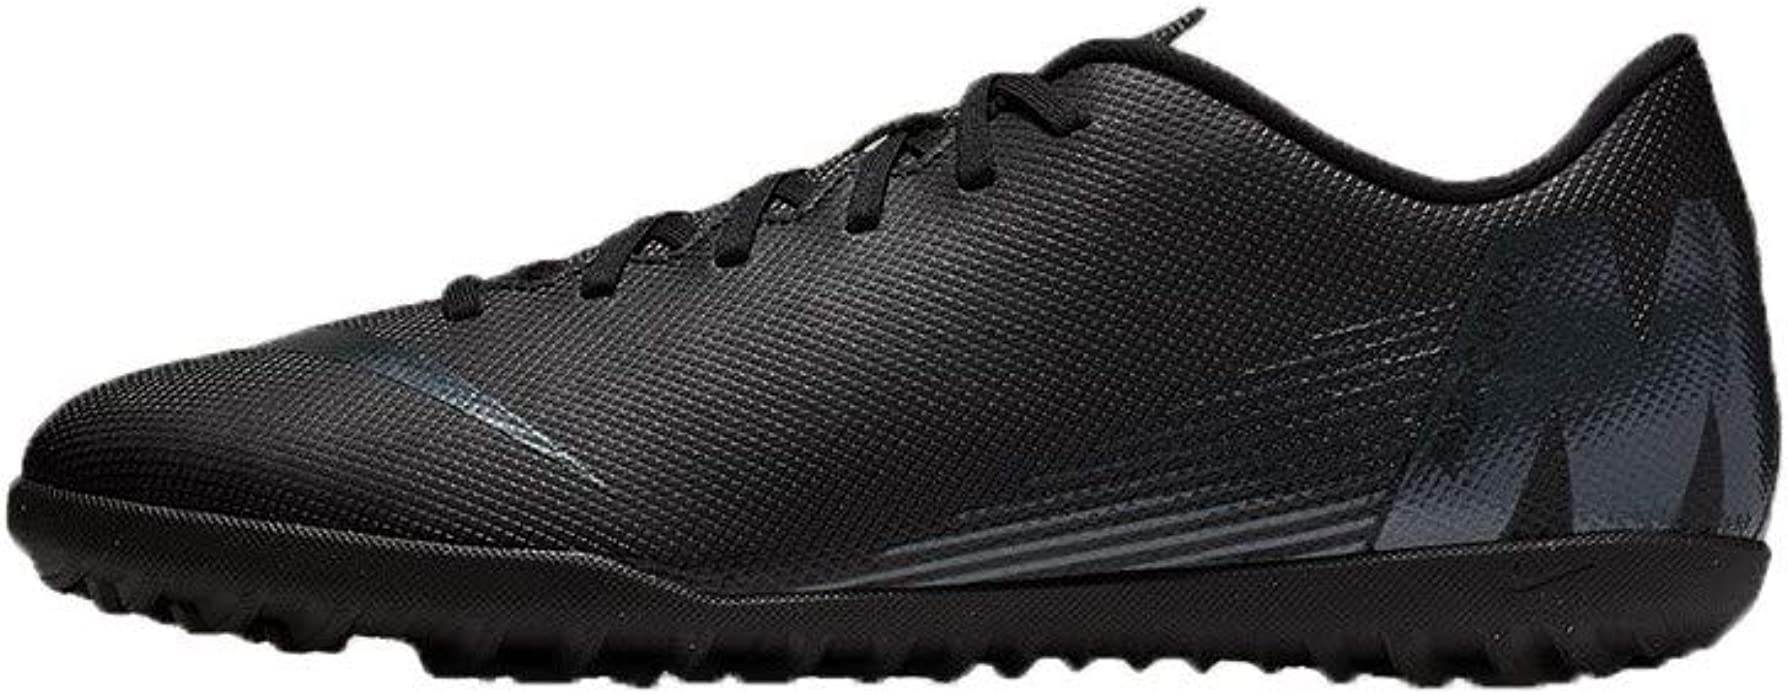 Amazon.com   Nike Men's Futsal Shoes